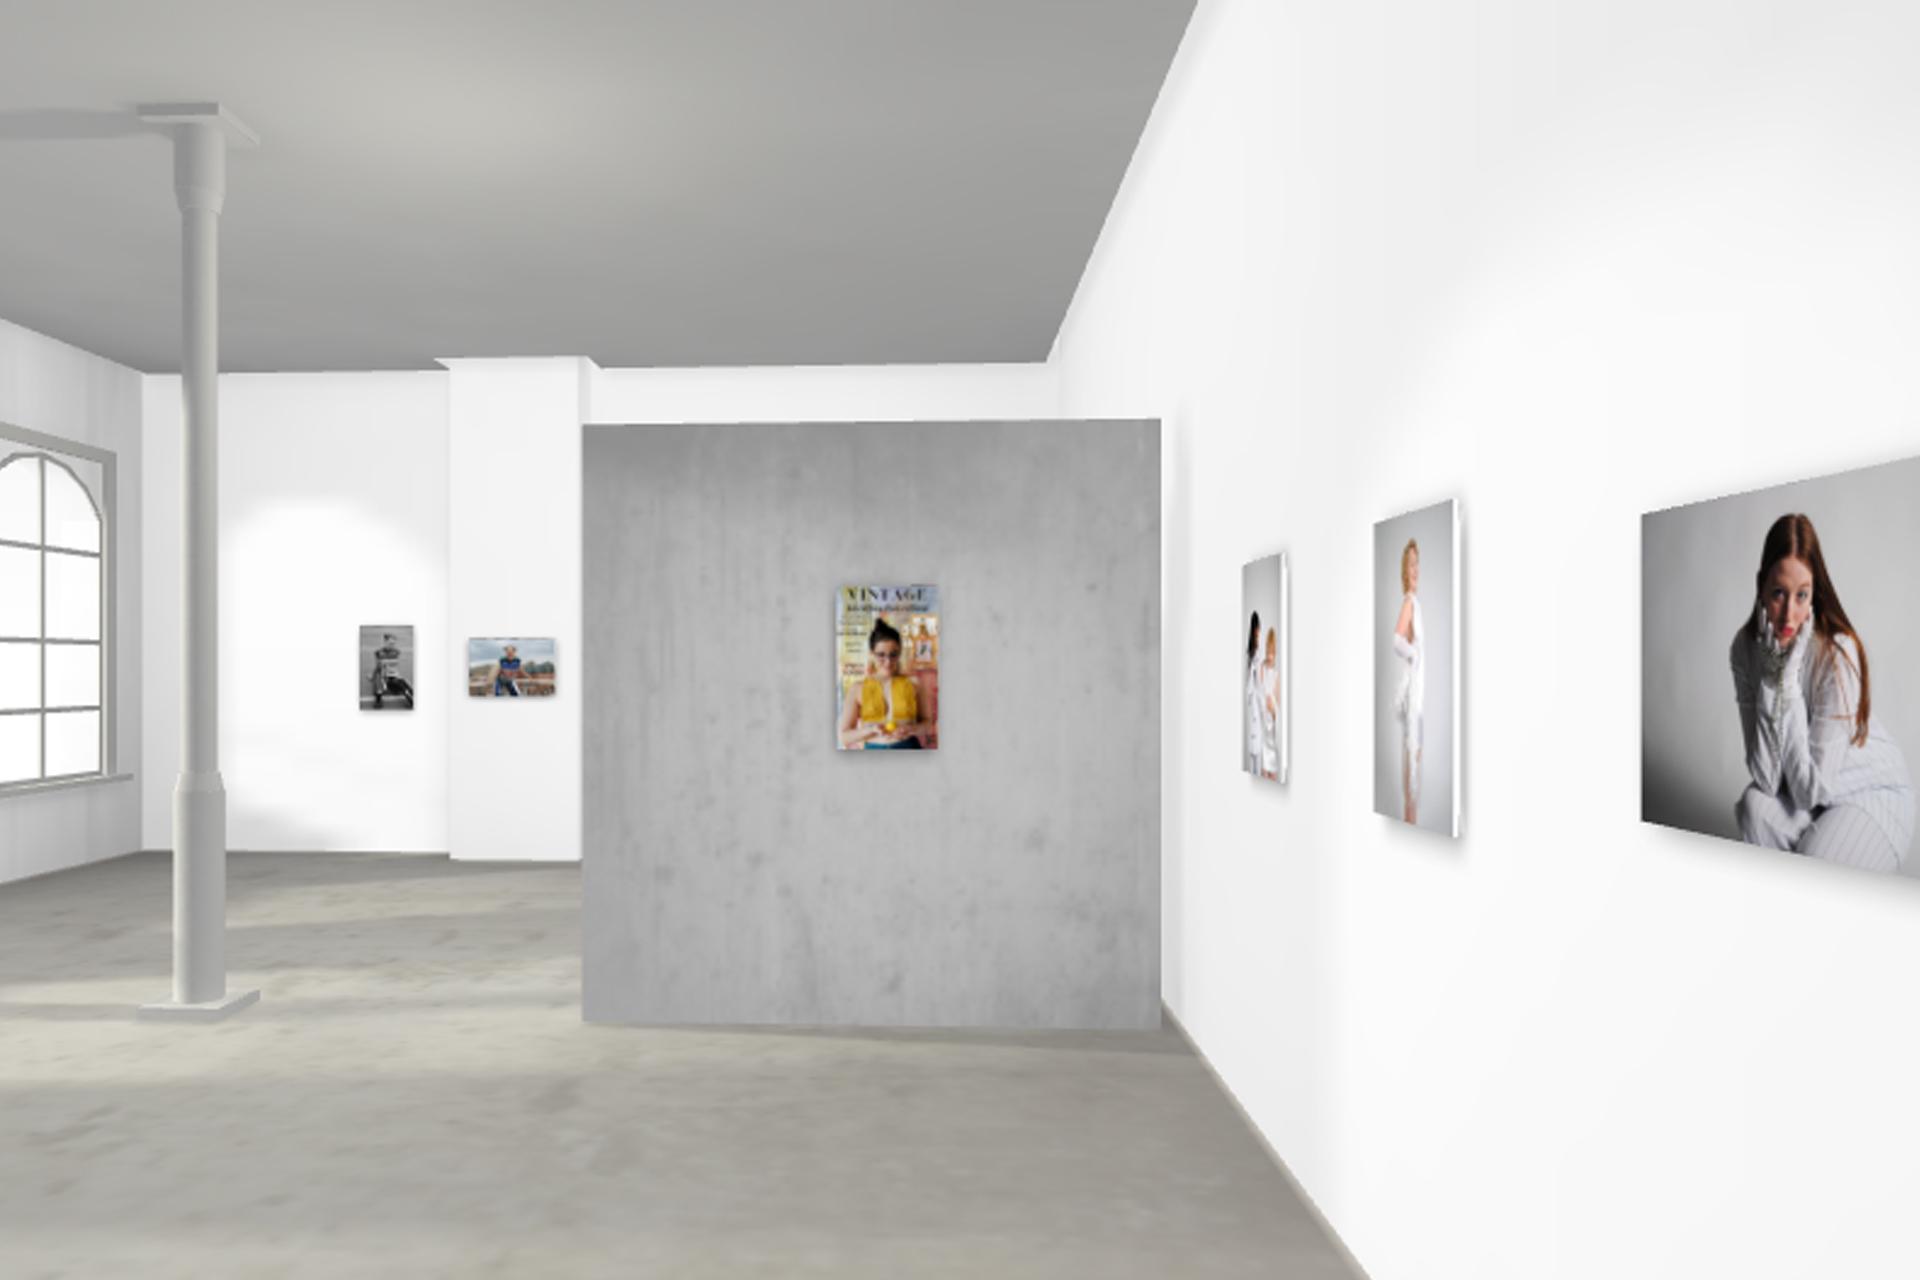 A preview of a virtual art exhibition